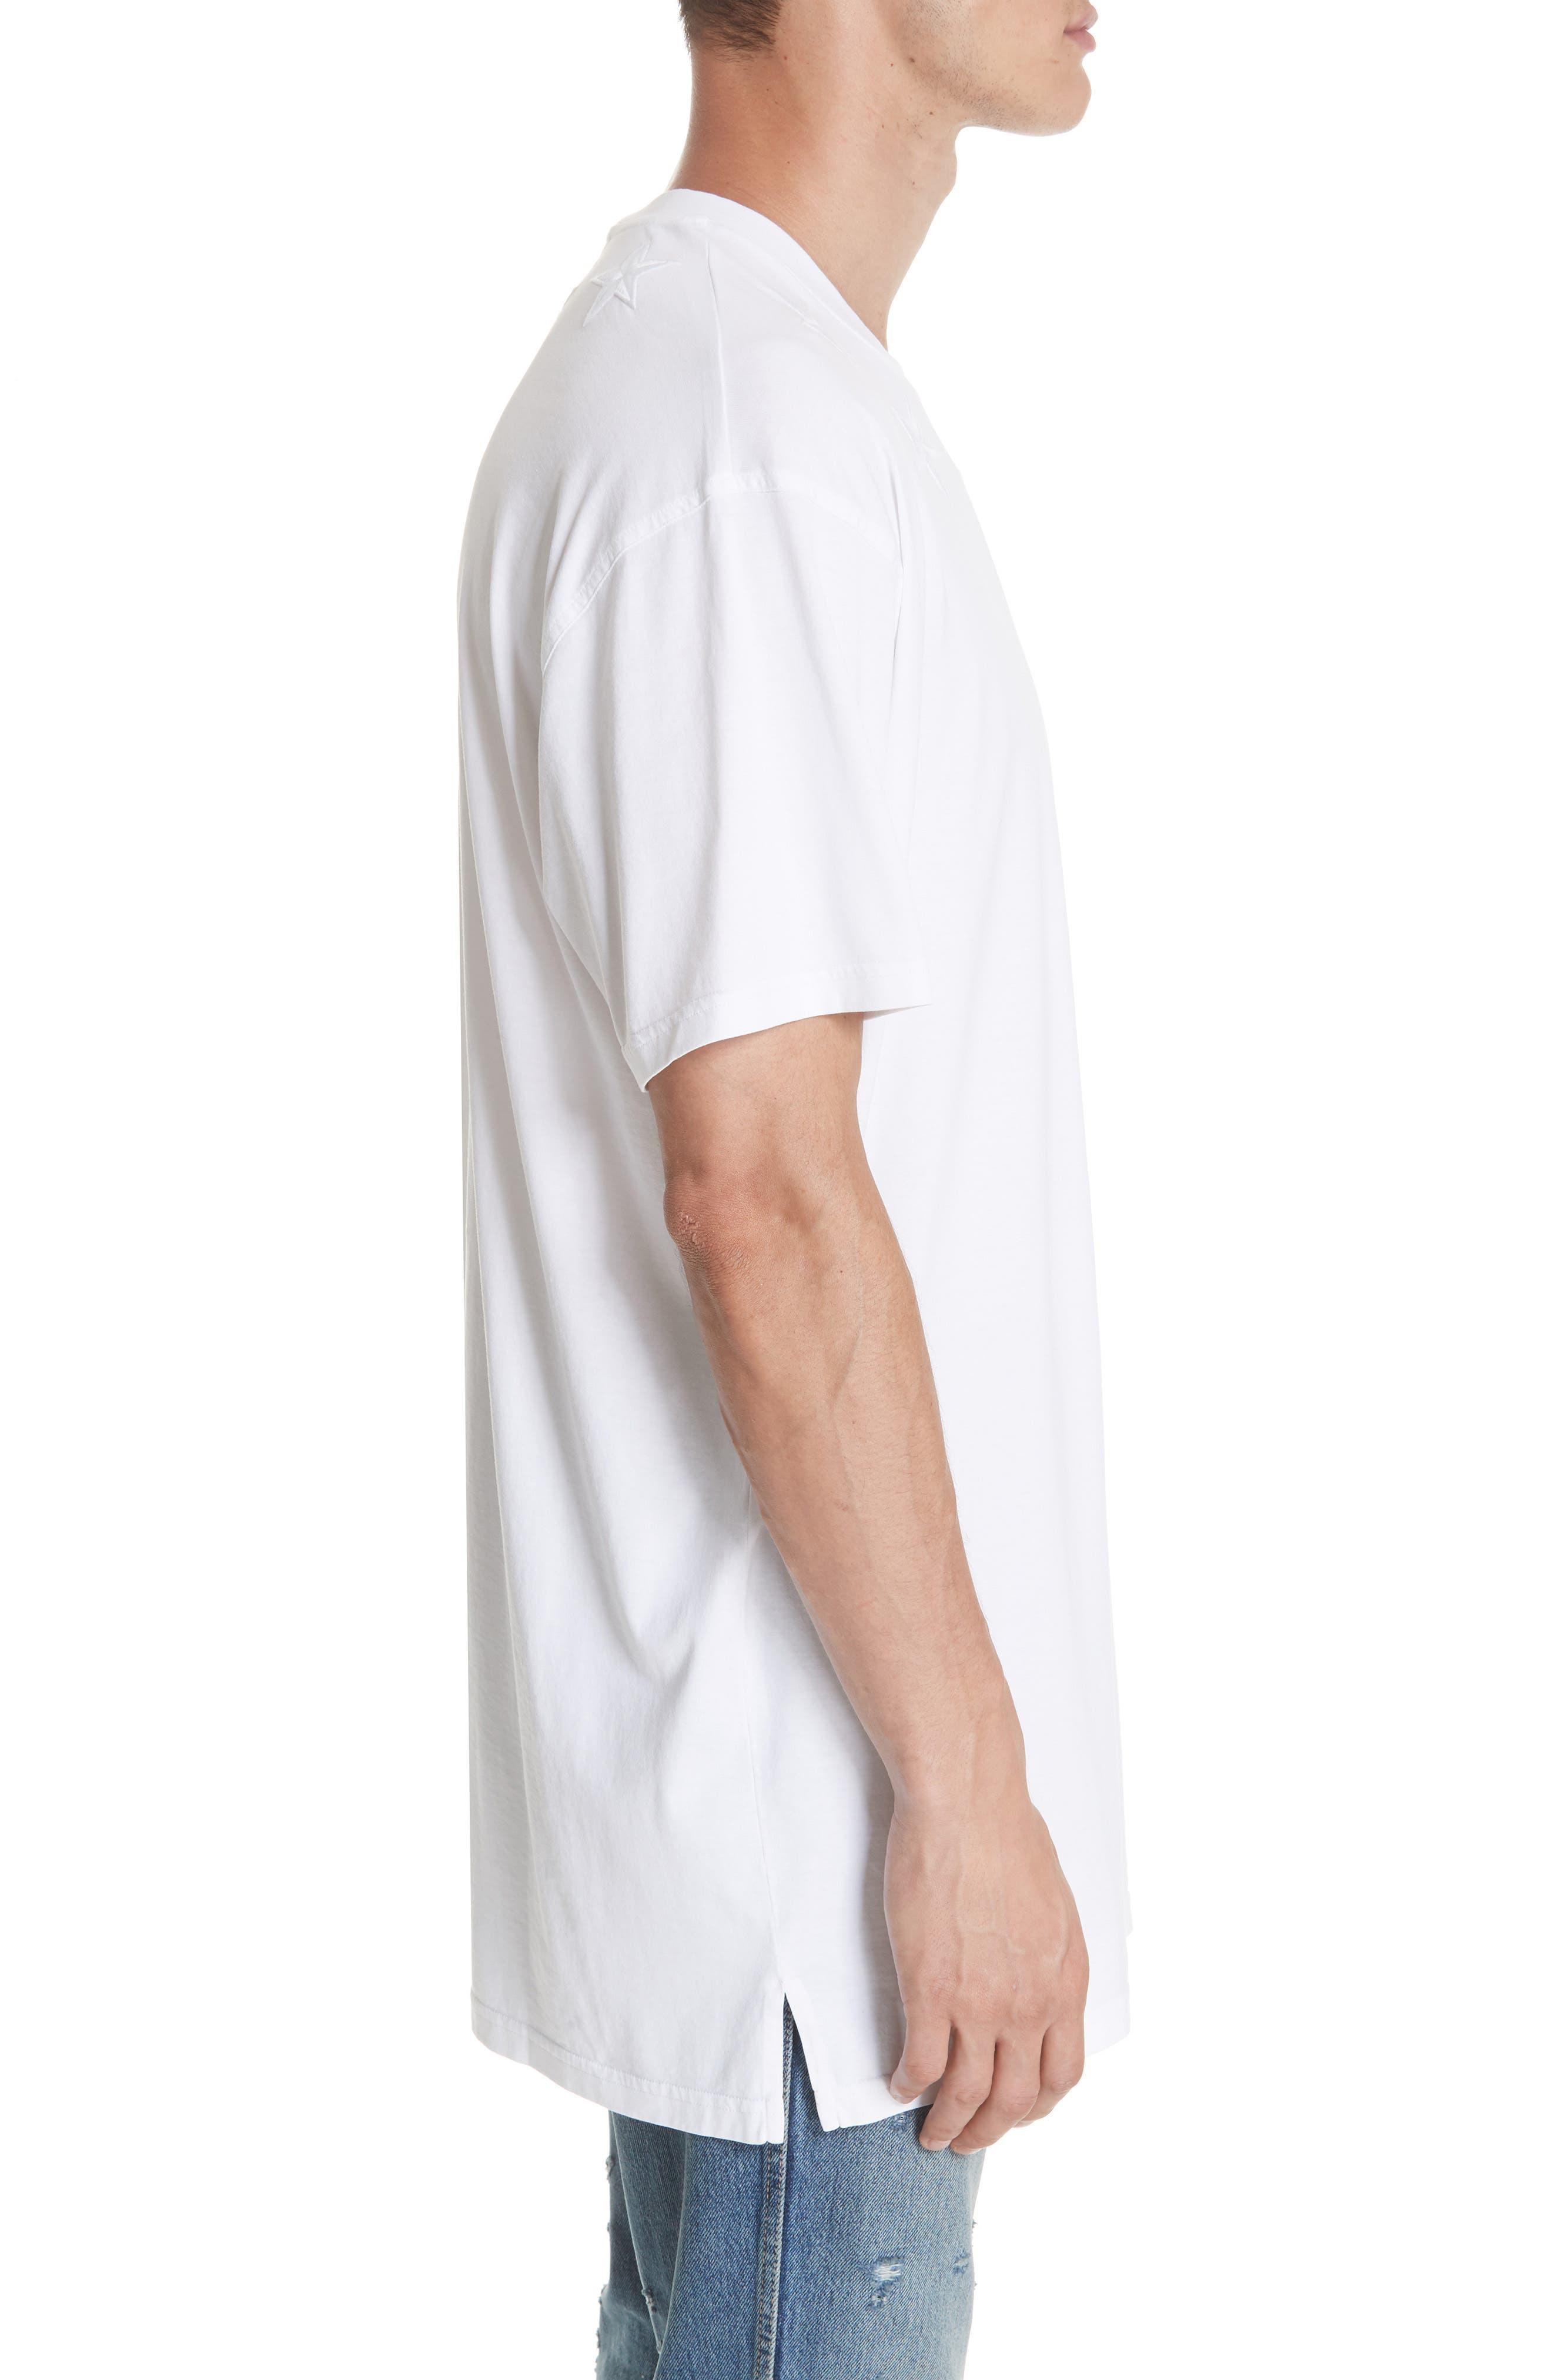 GIVENCHY,                             Star Appliqué T-Shirt,                             Alternate thumbnail 3, color,                             WHITE